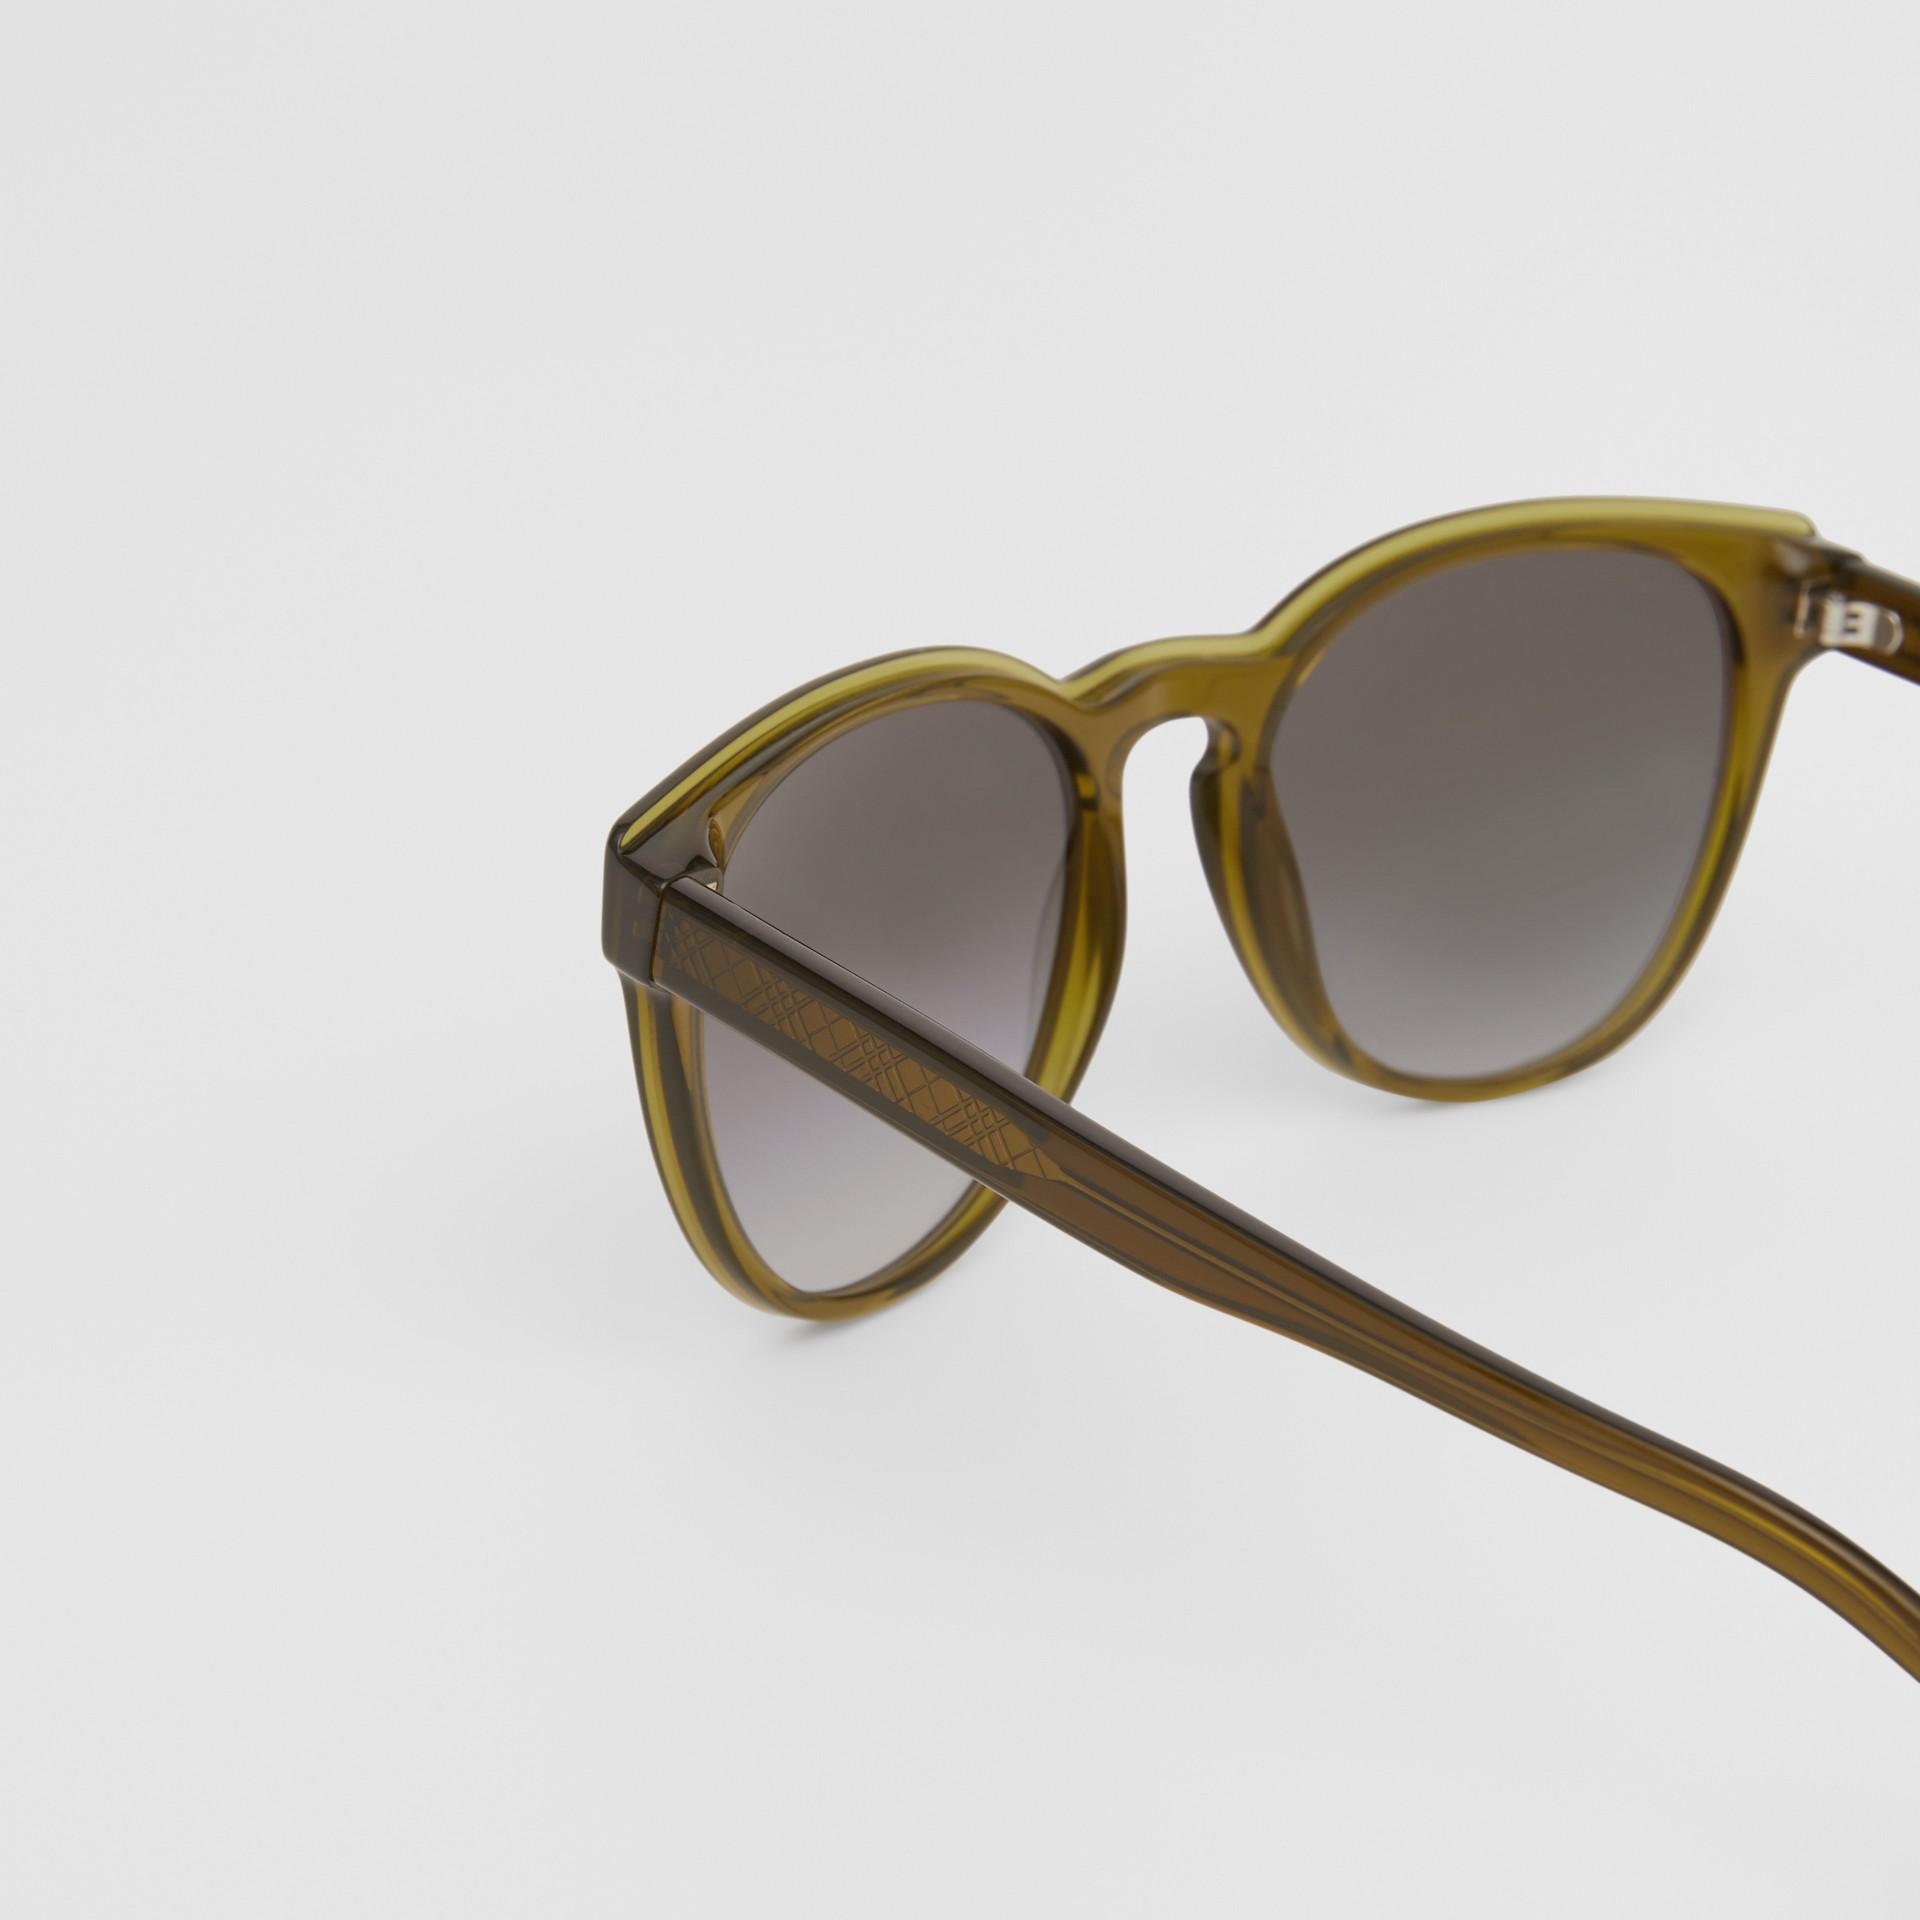 Round Frame Sunglasses in Olive - Men | Burberry Australia - gallery image 1